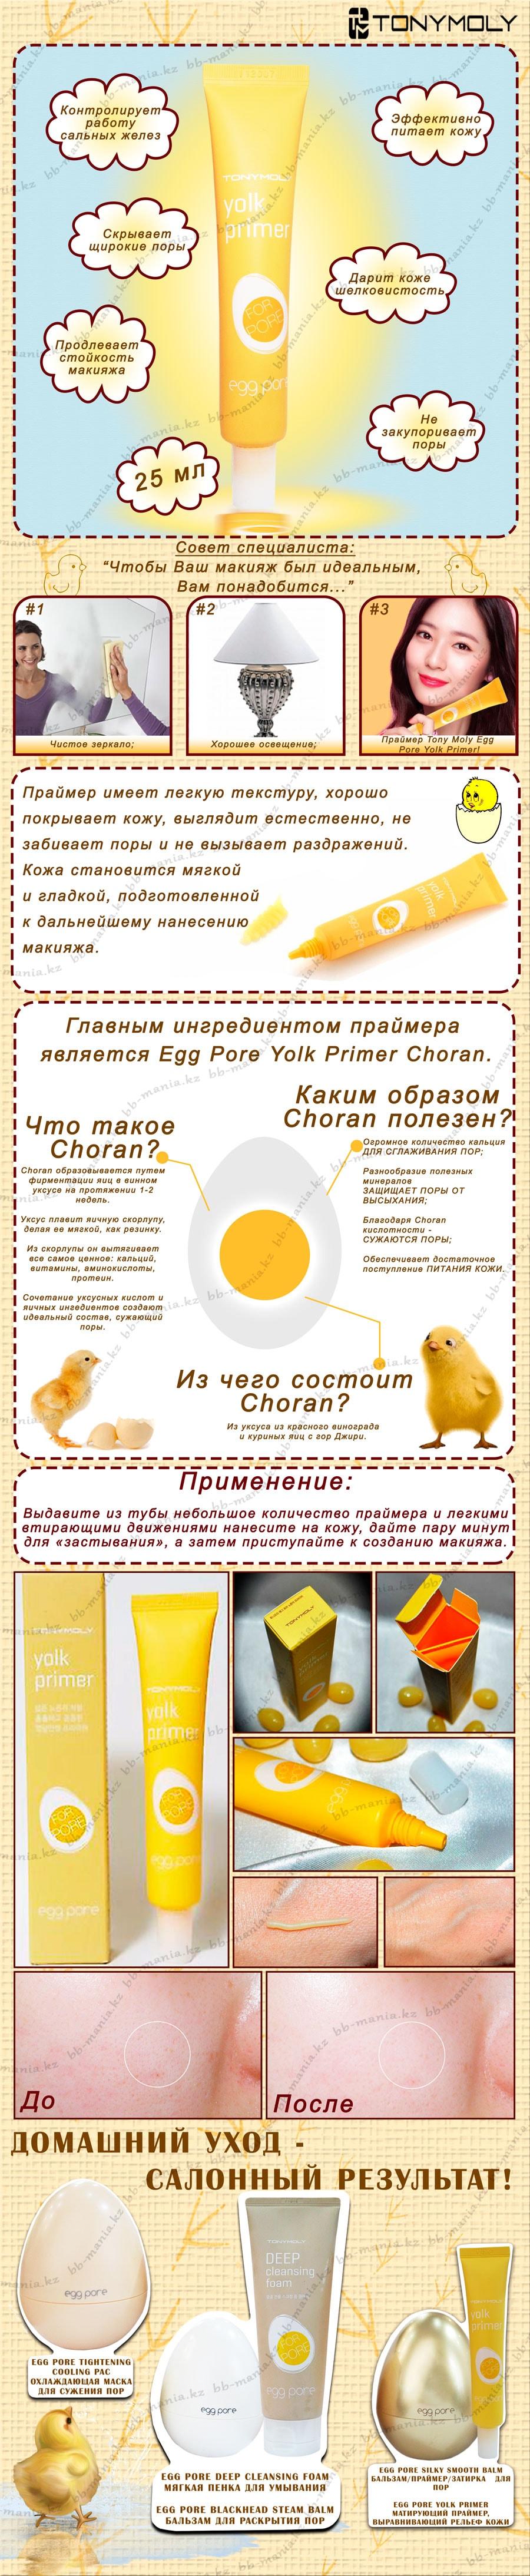 Egg-Pore-Yolk-Primer-[Tony-Moly]-min (1)